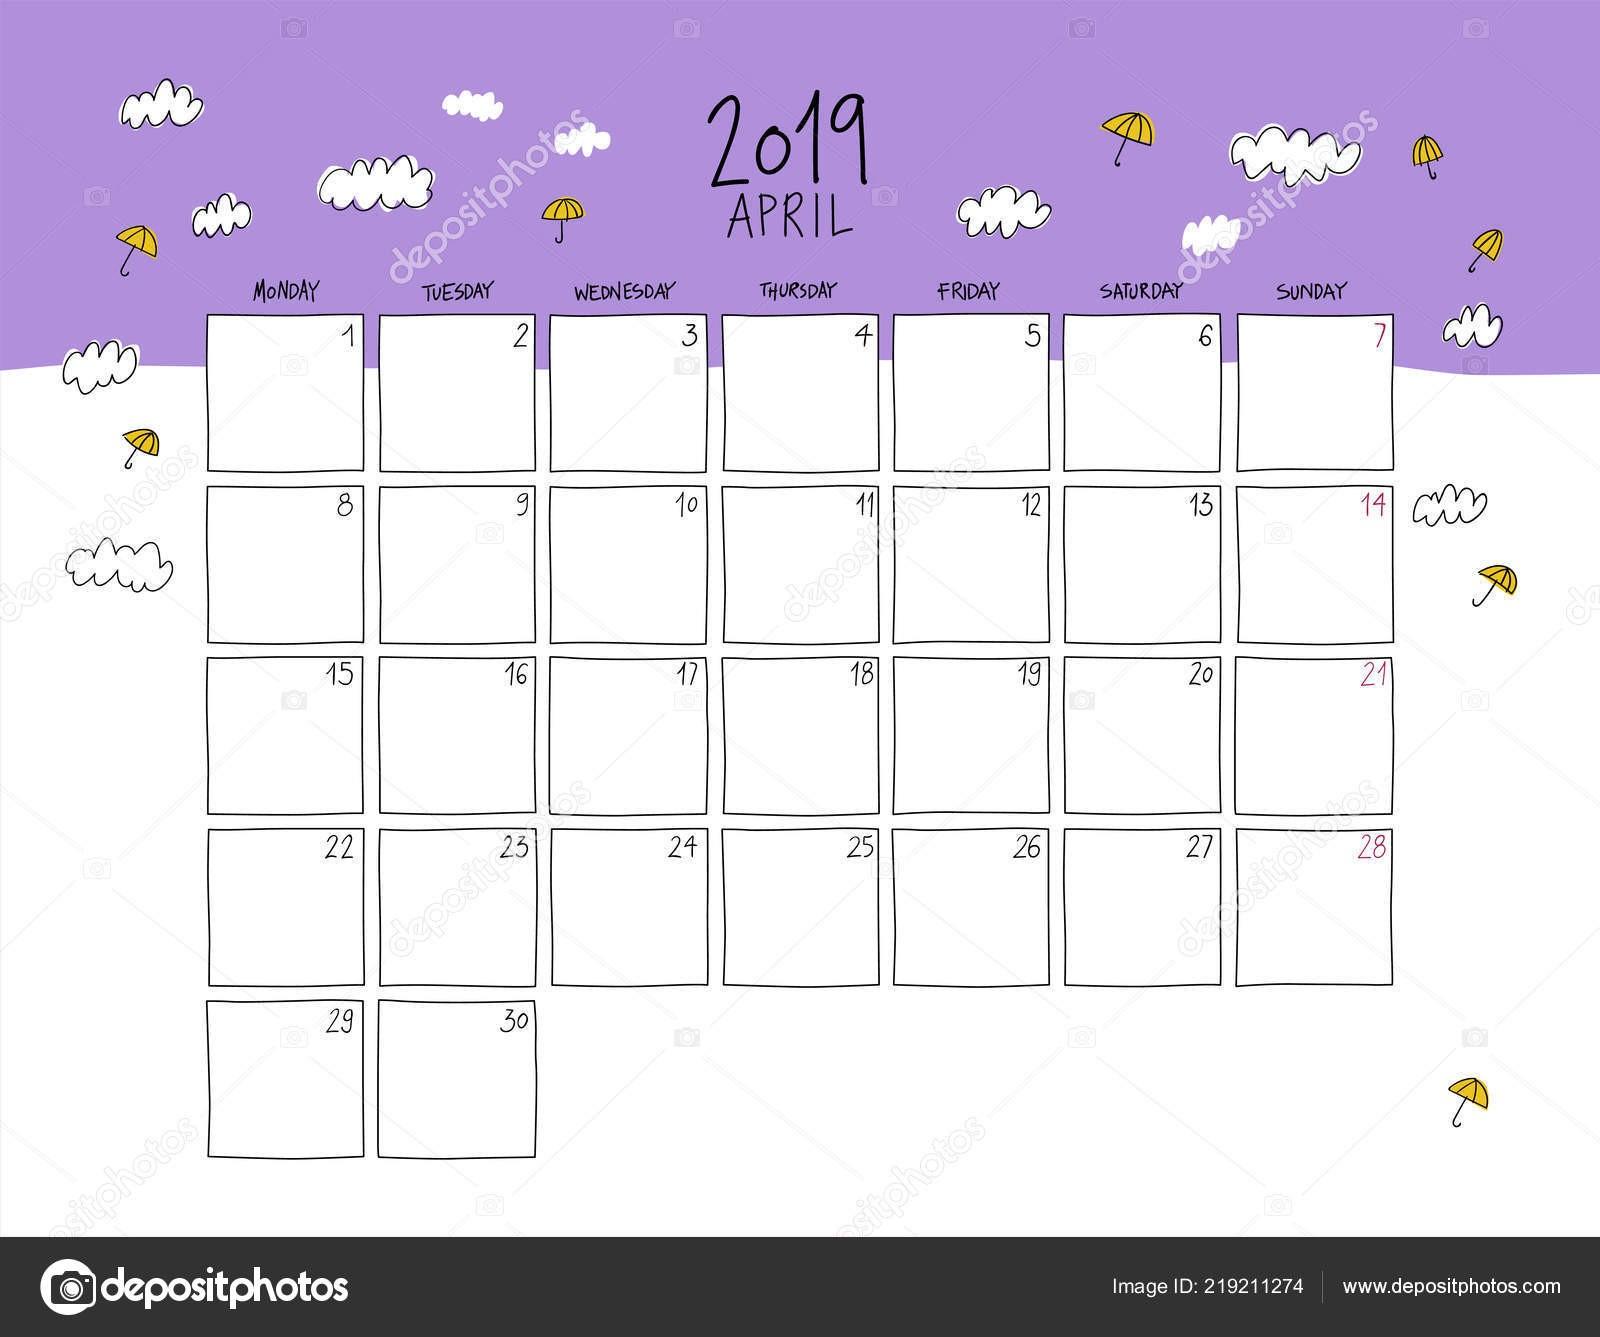 Nástěnn½ kalendář na duben 2019 Barevná skica vodorovné Å¡ablona — Vektor od LaraFields